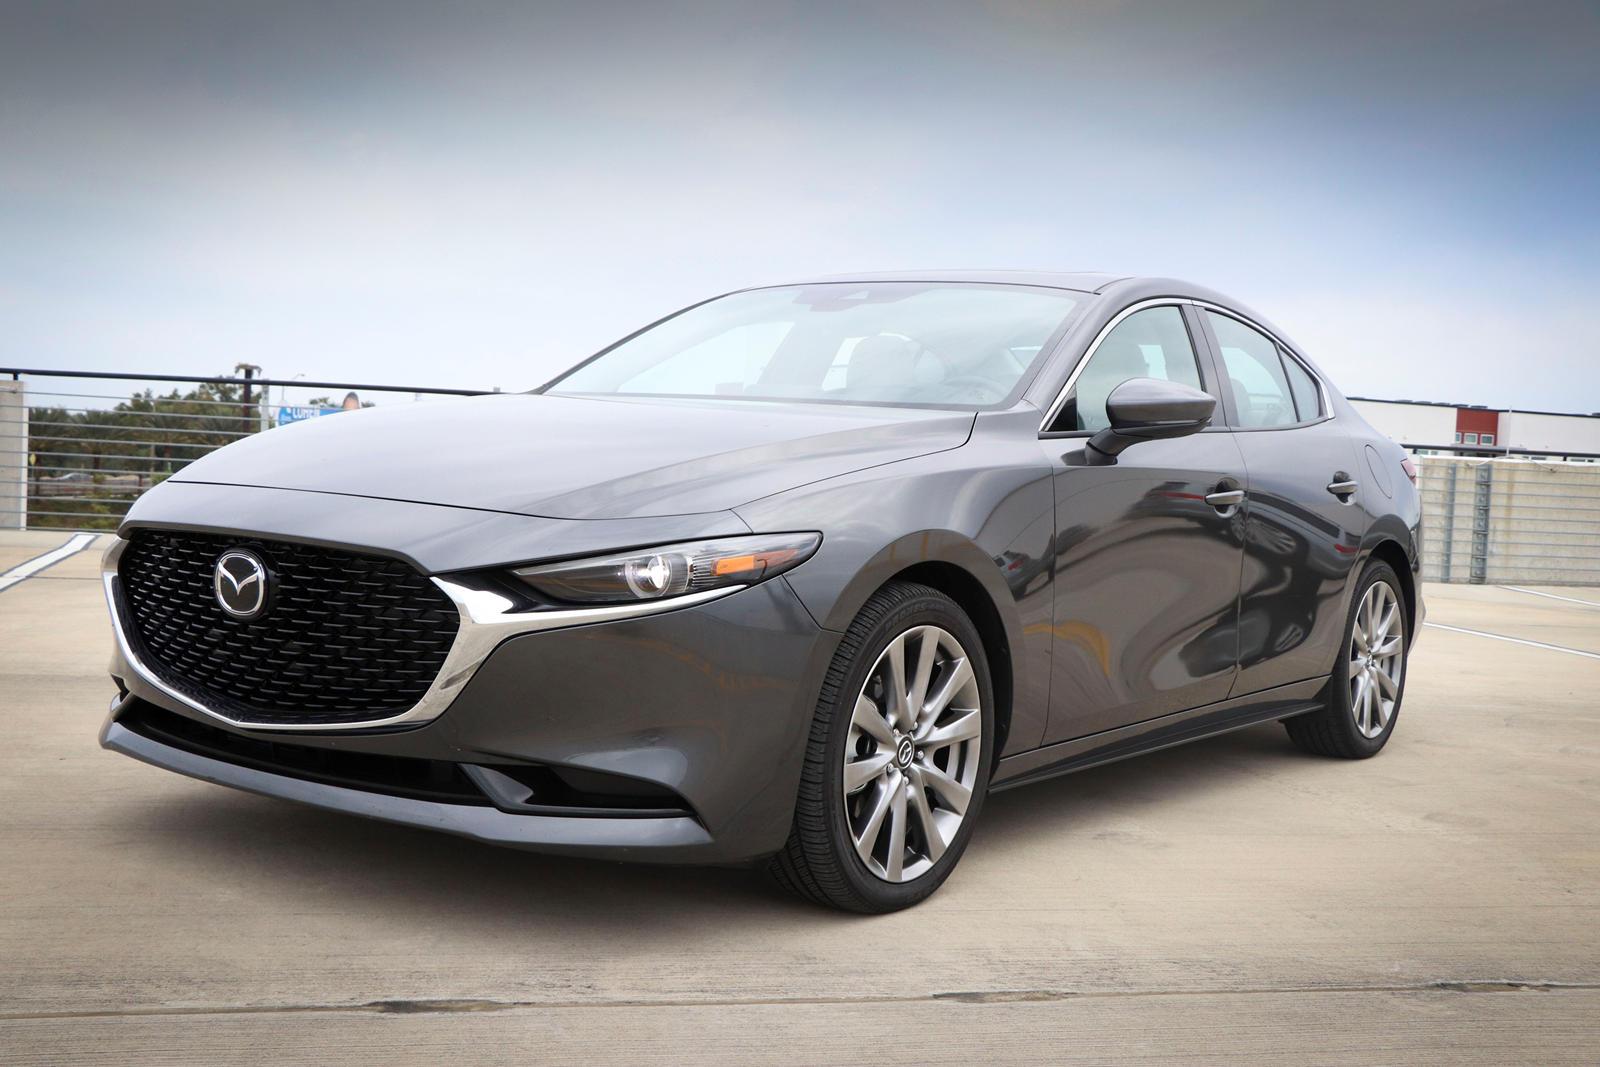 2020 Mazda 3 Sedan Spesification